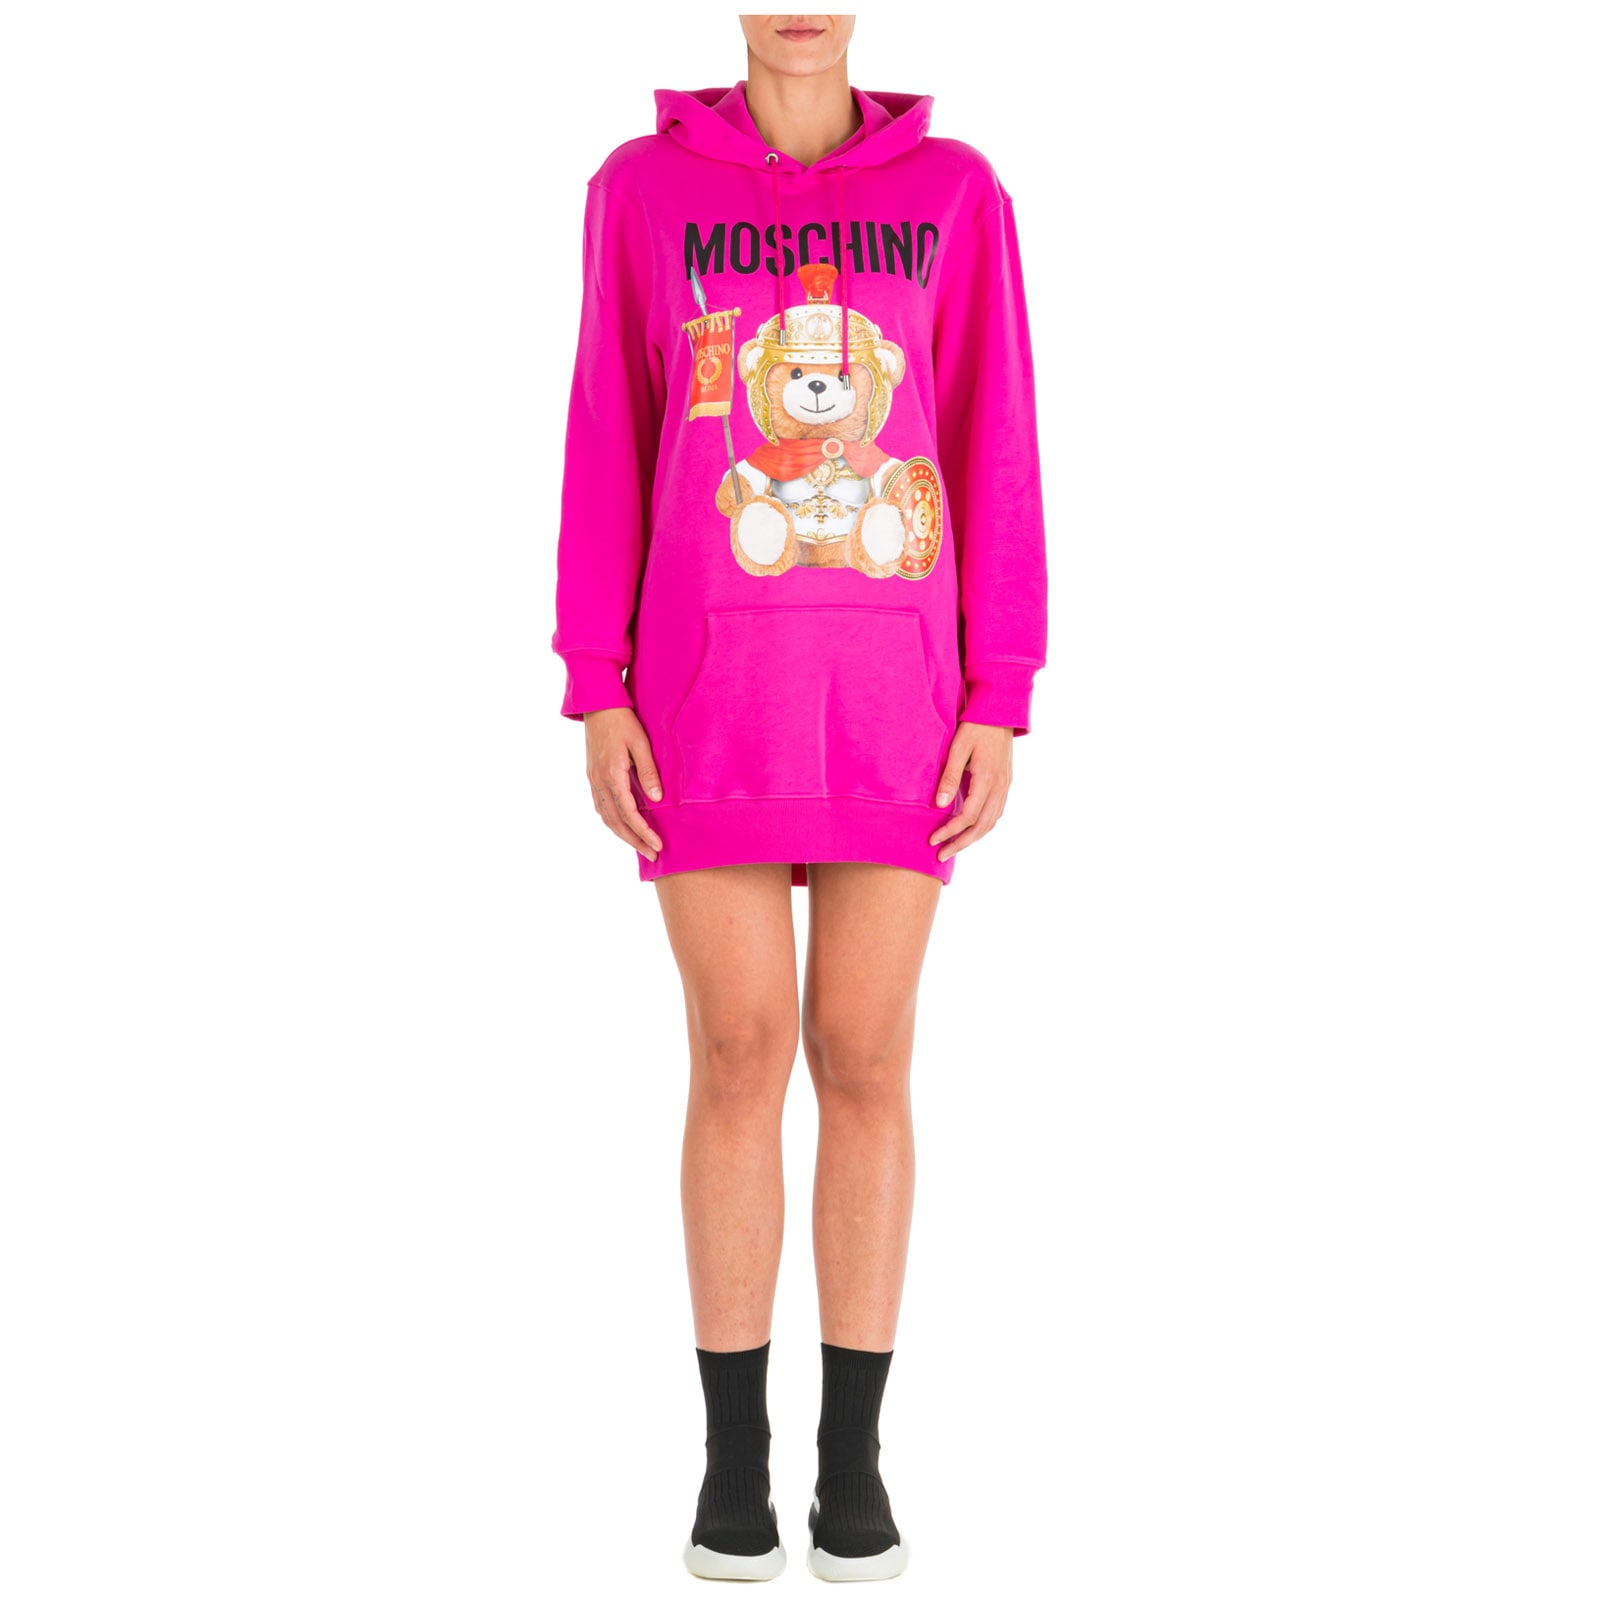 Moschino Sweatshirt Dress Roman Teddy Bear